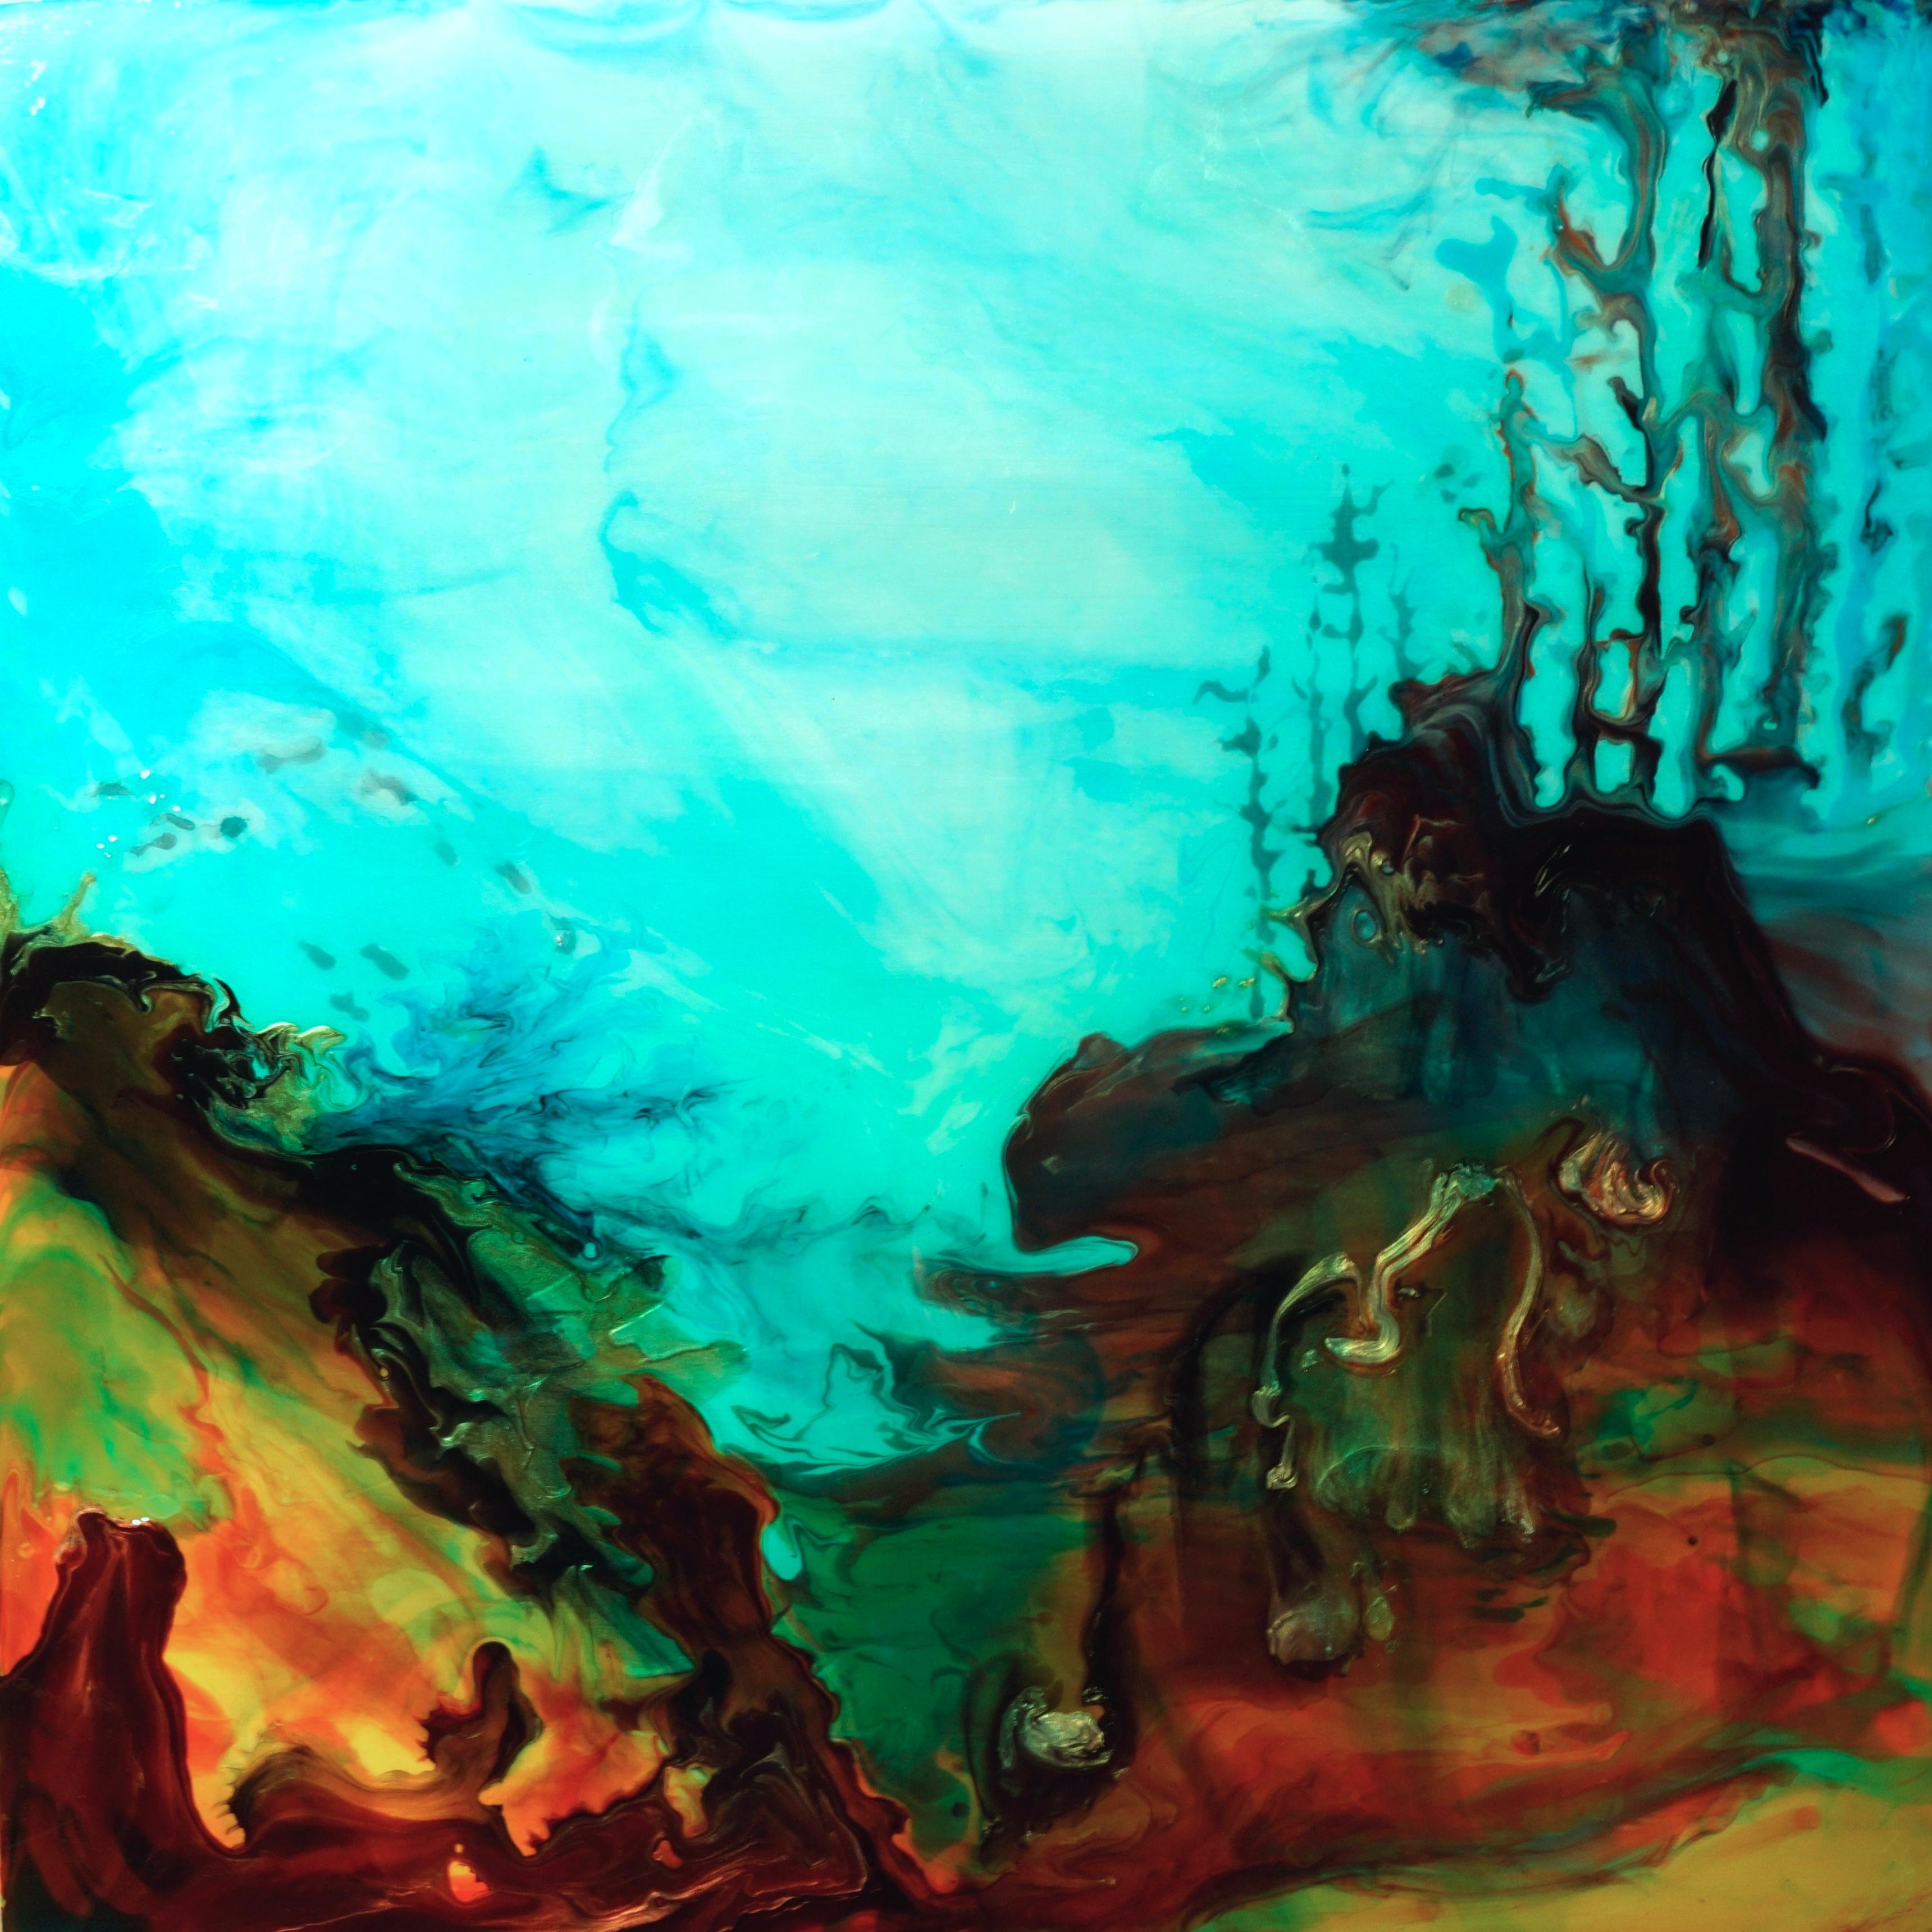 Pour Painting - Ocean floor painting